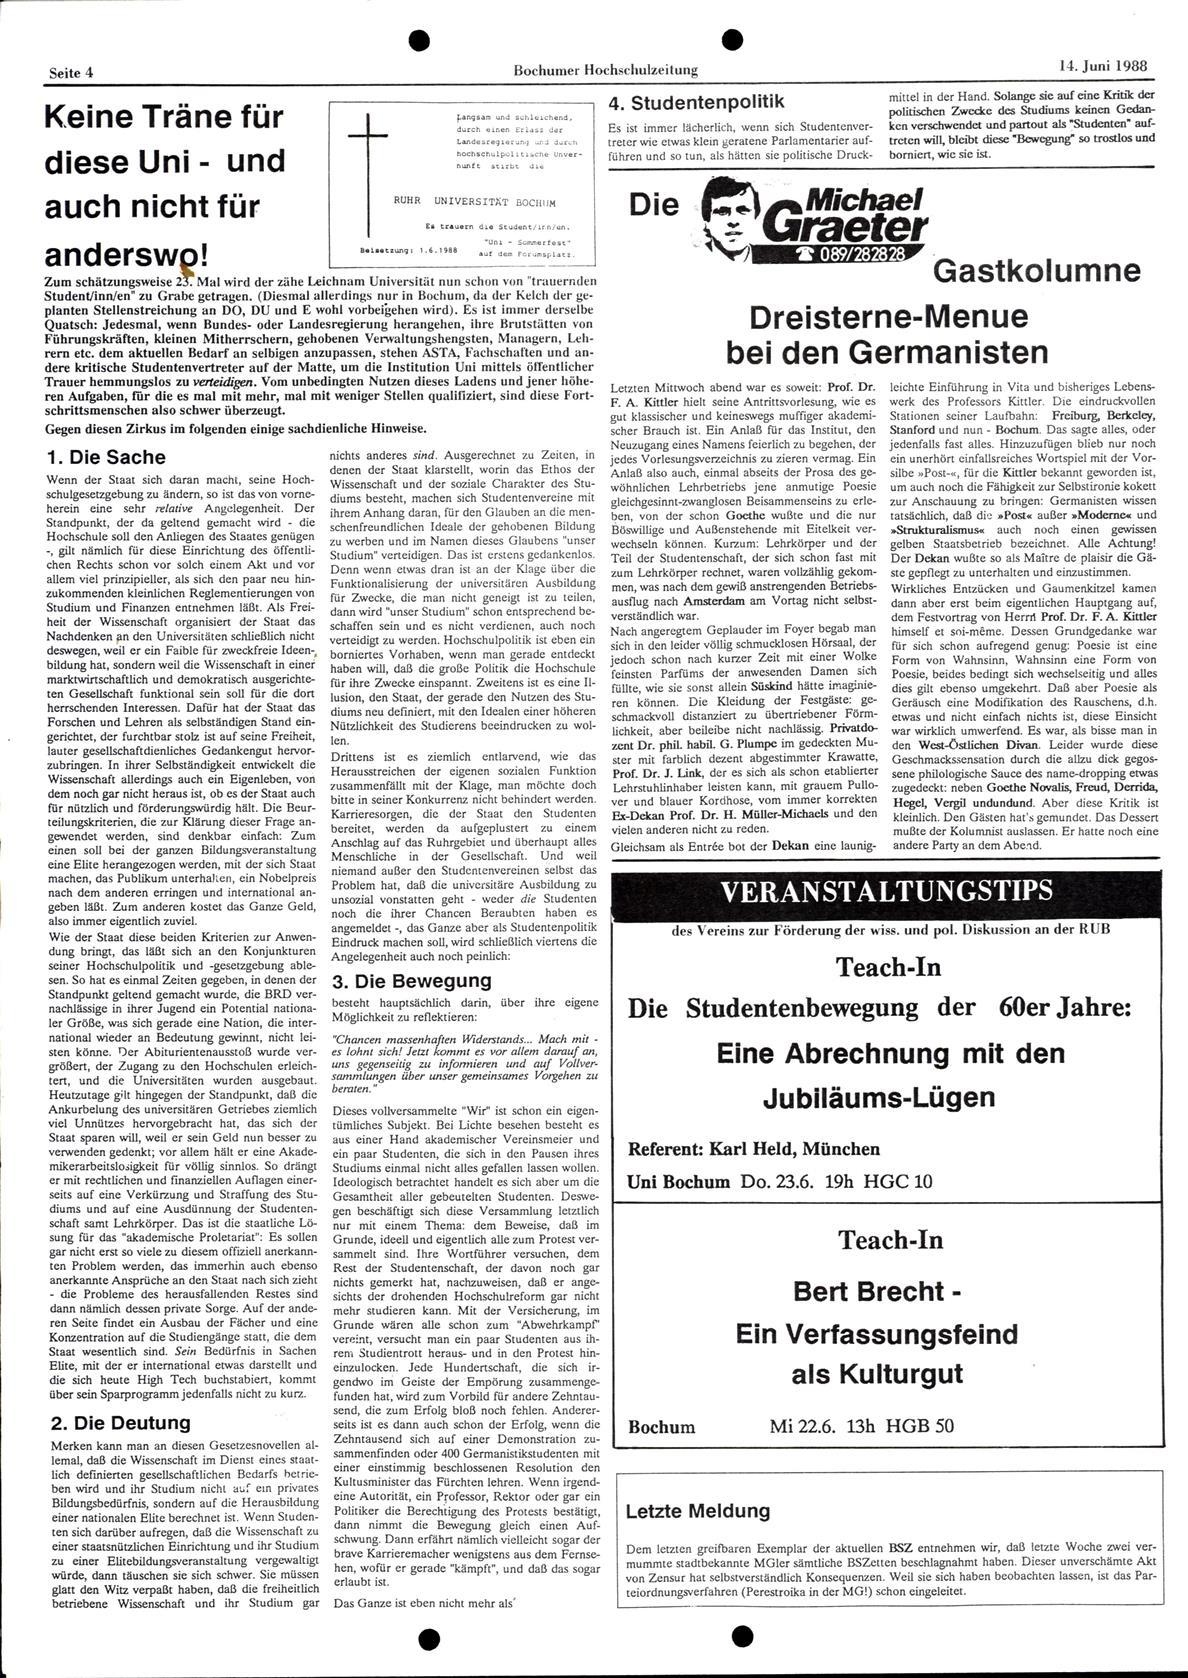 Bochum_BHZ_19880614_172_004